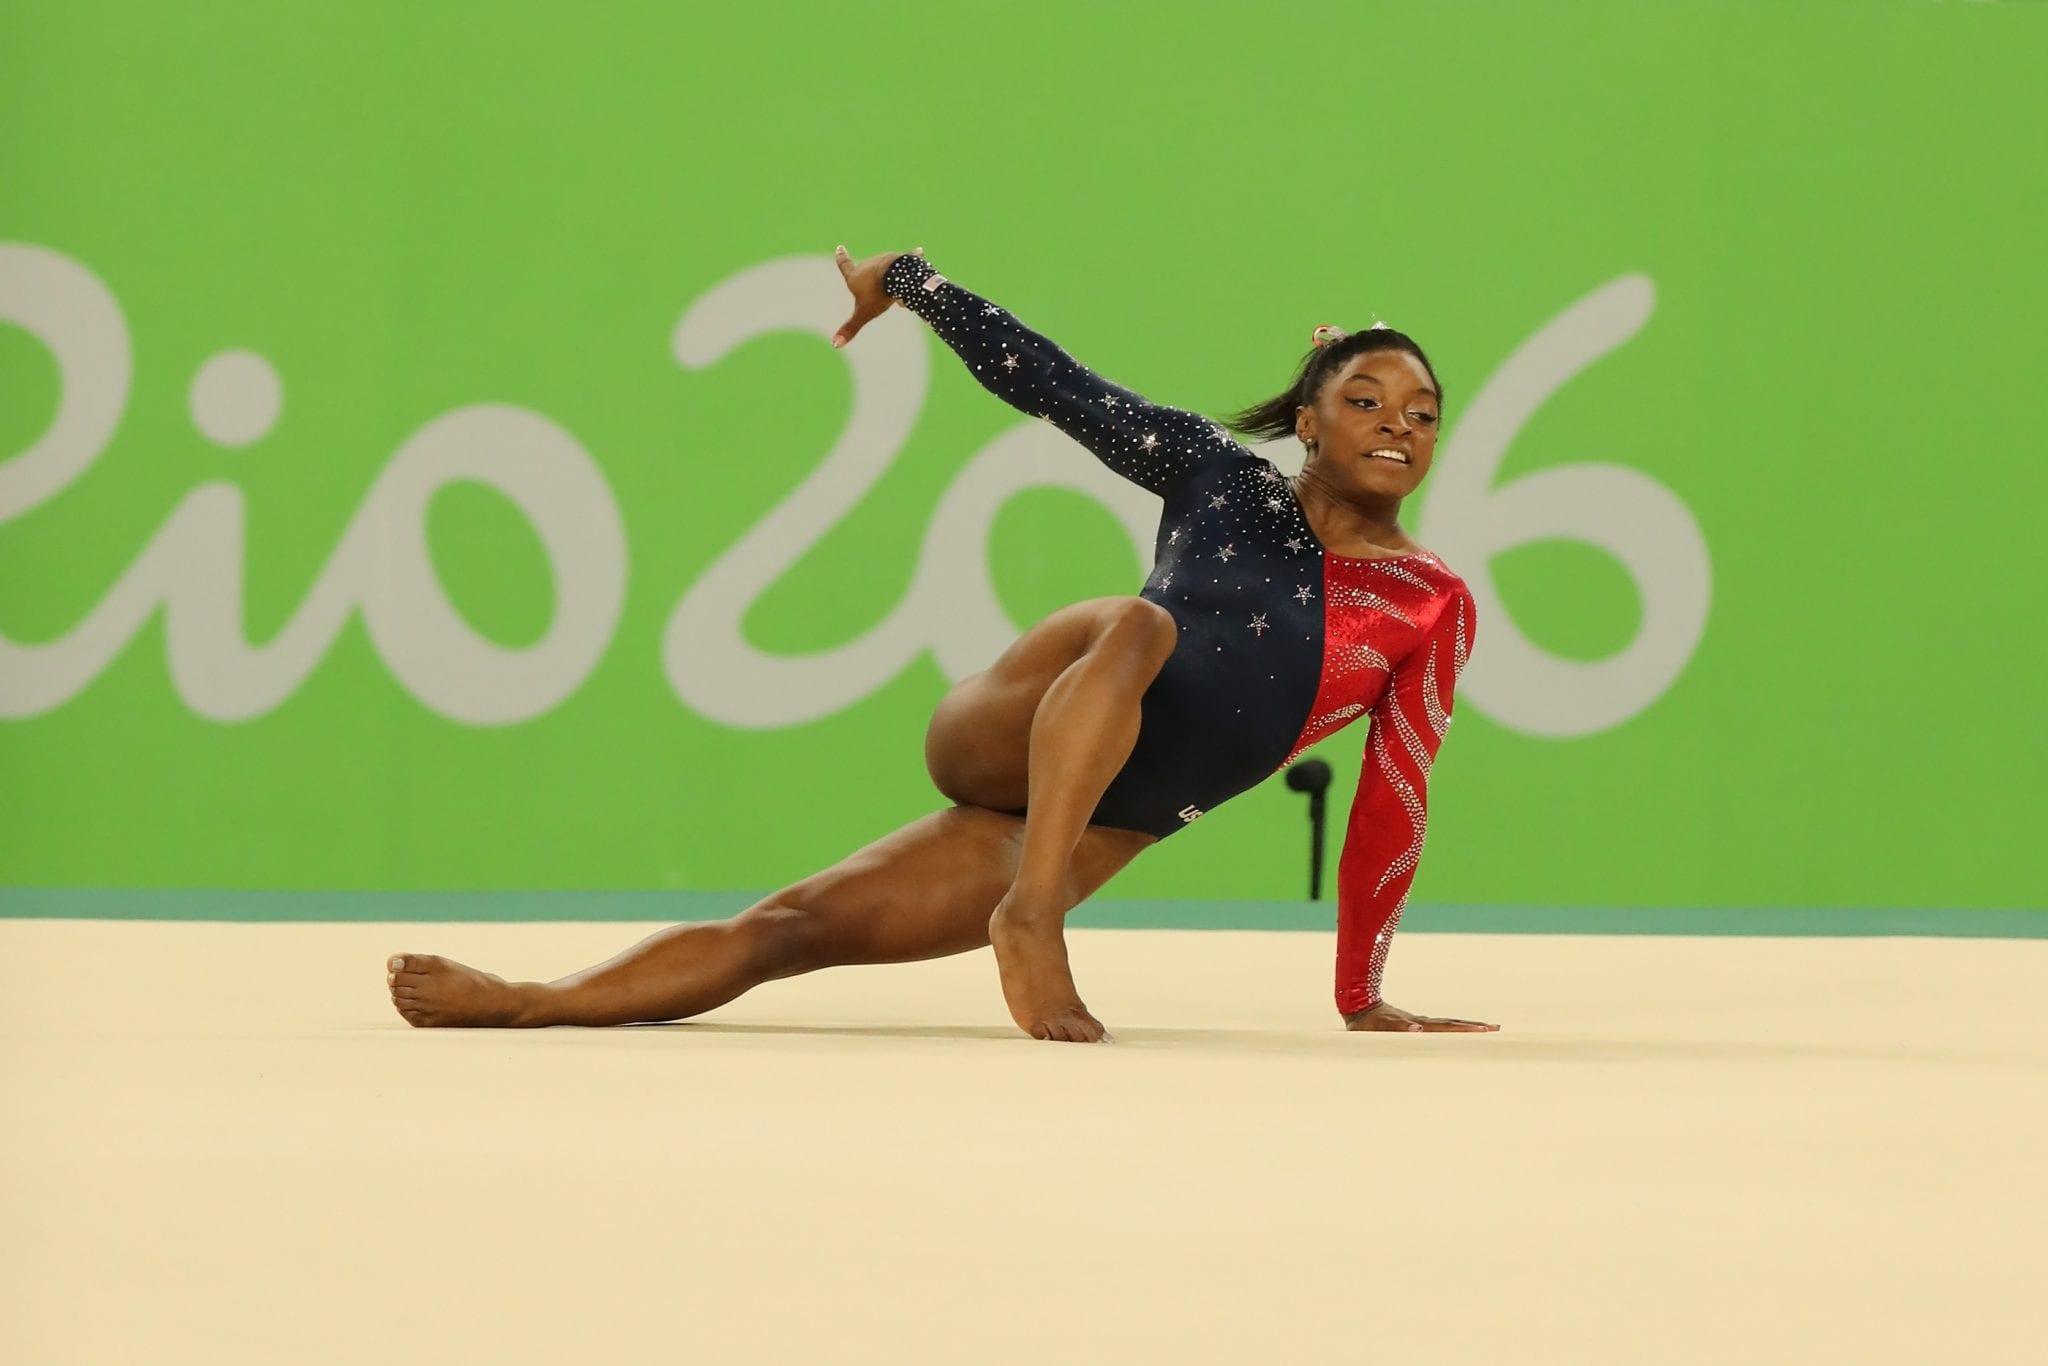 Gymnast Simone Biles at Rio 2016